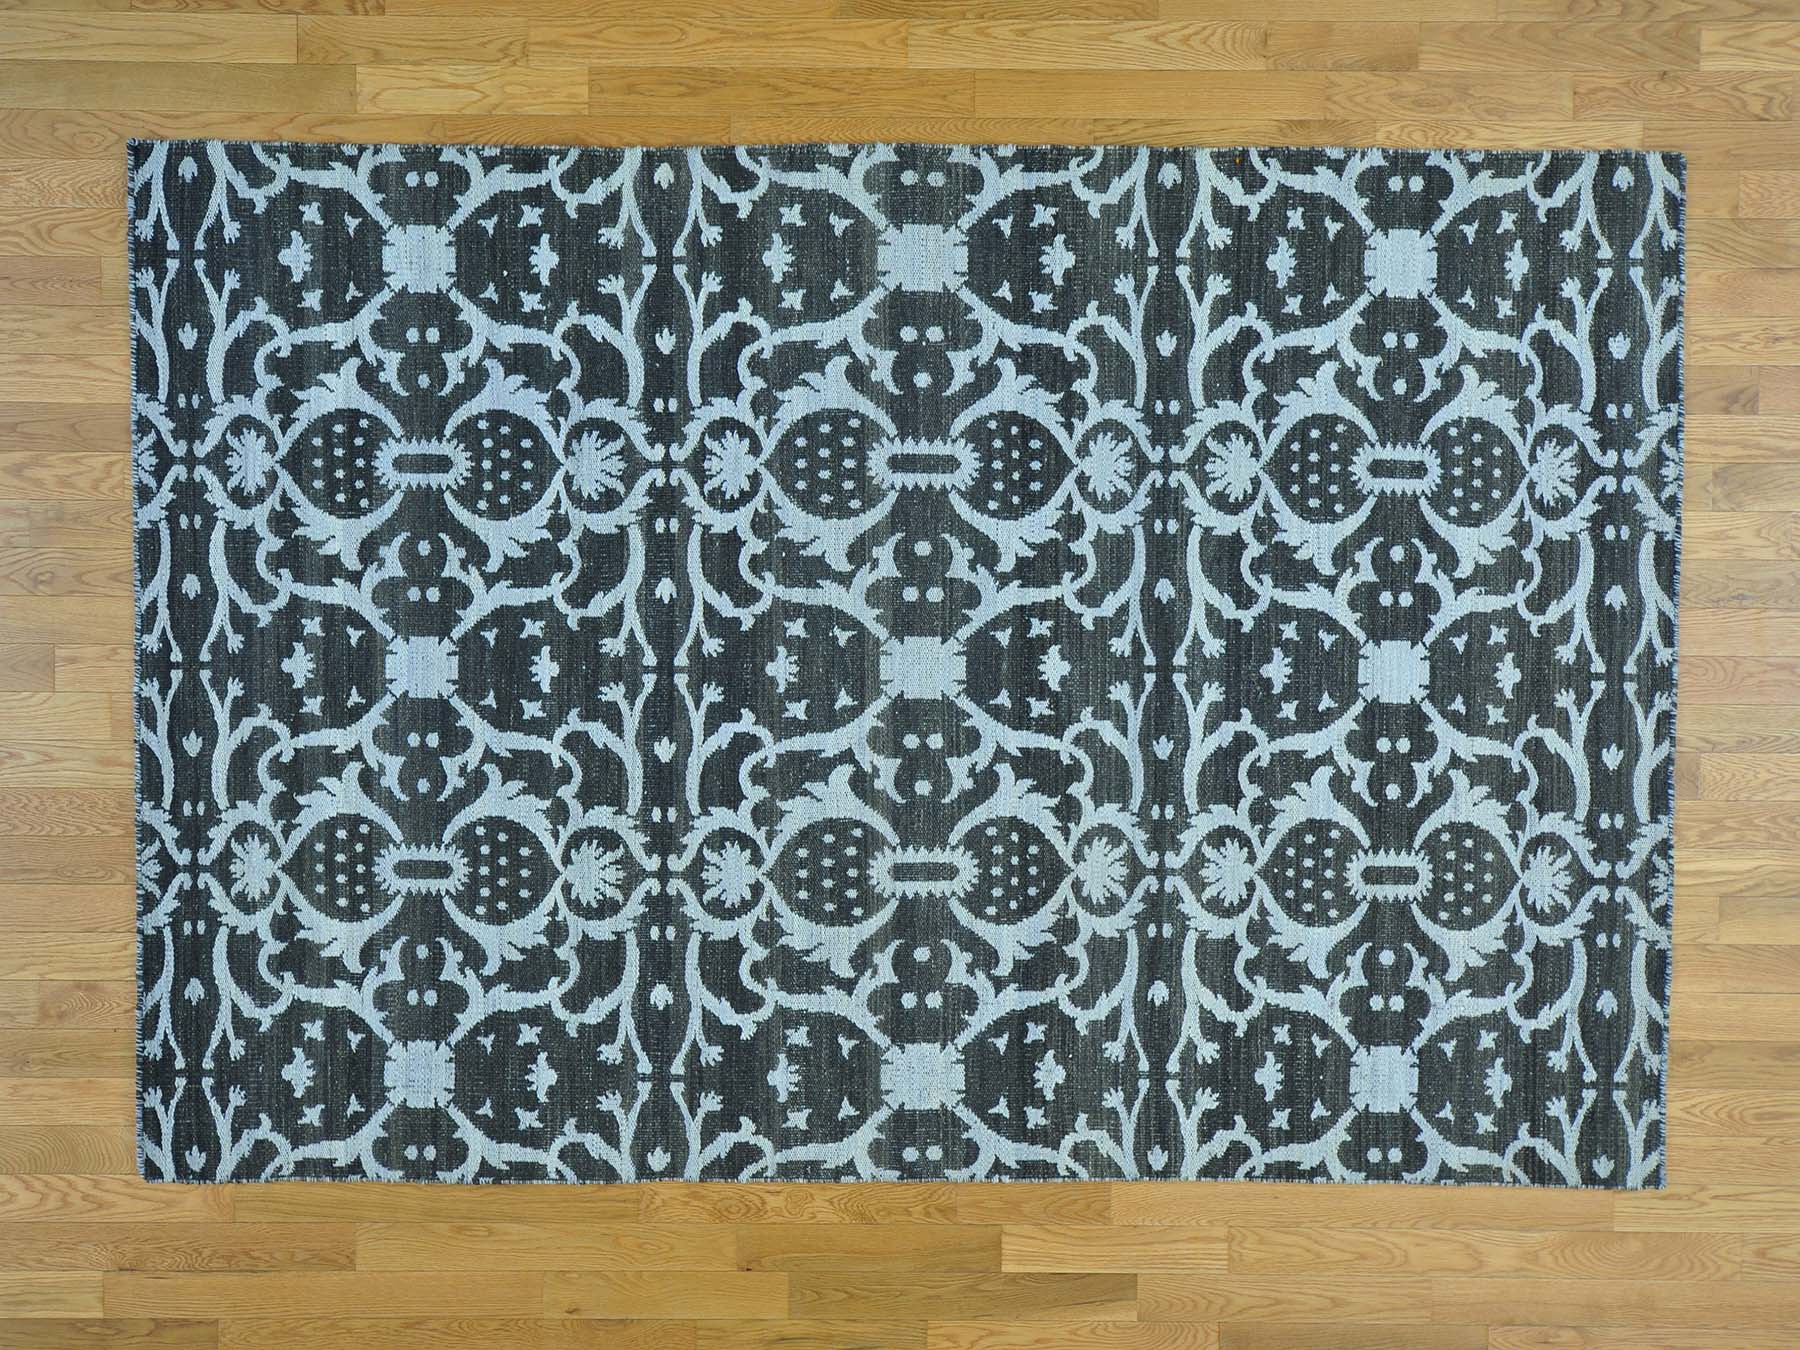 5-10 x8-8  Killim Reversible Oriental Hand Woven Flat Weave Rug